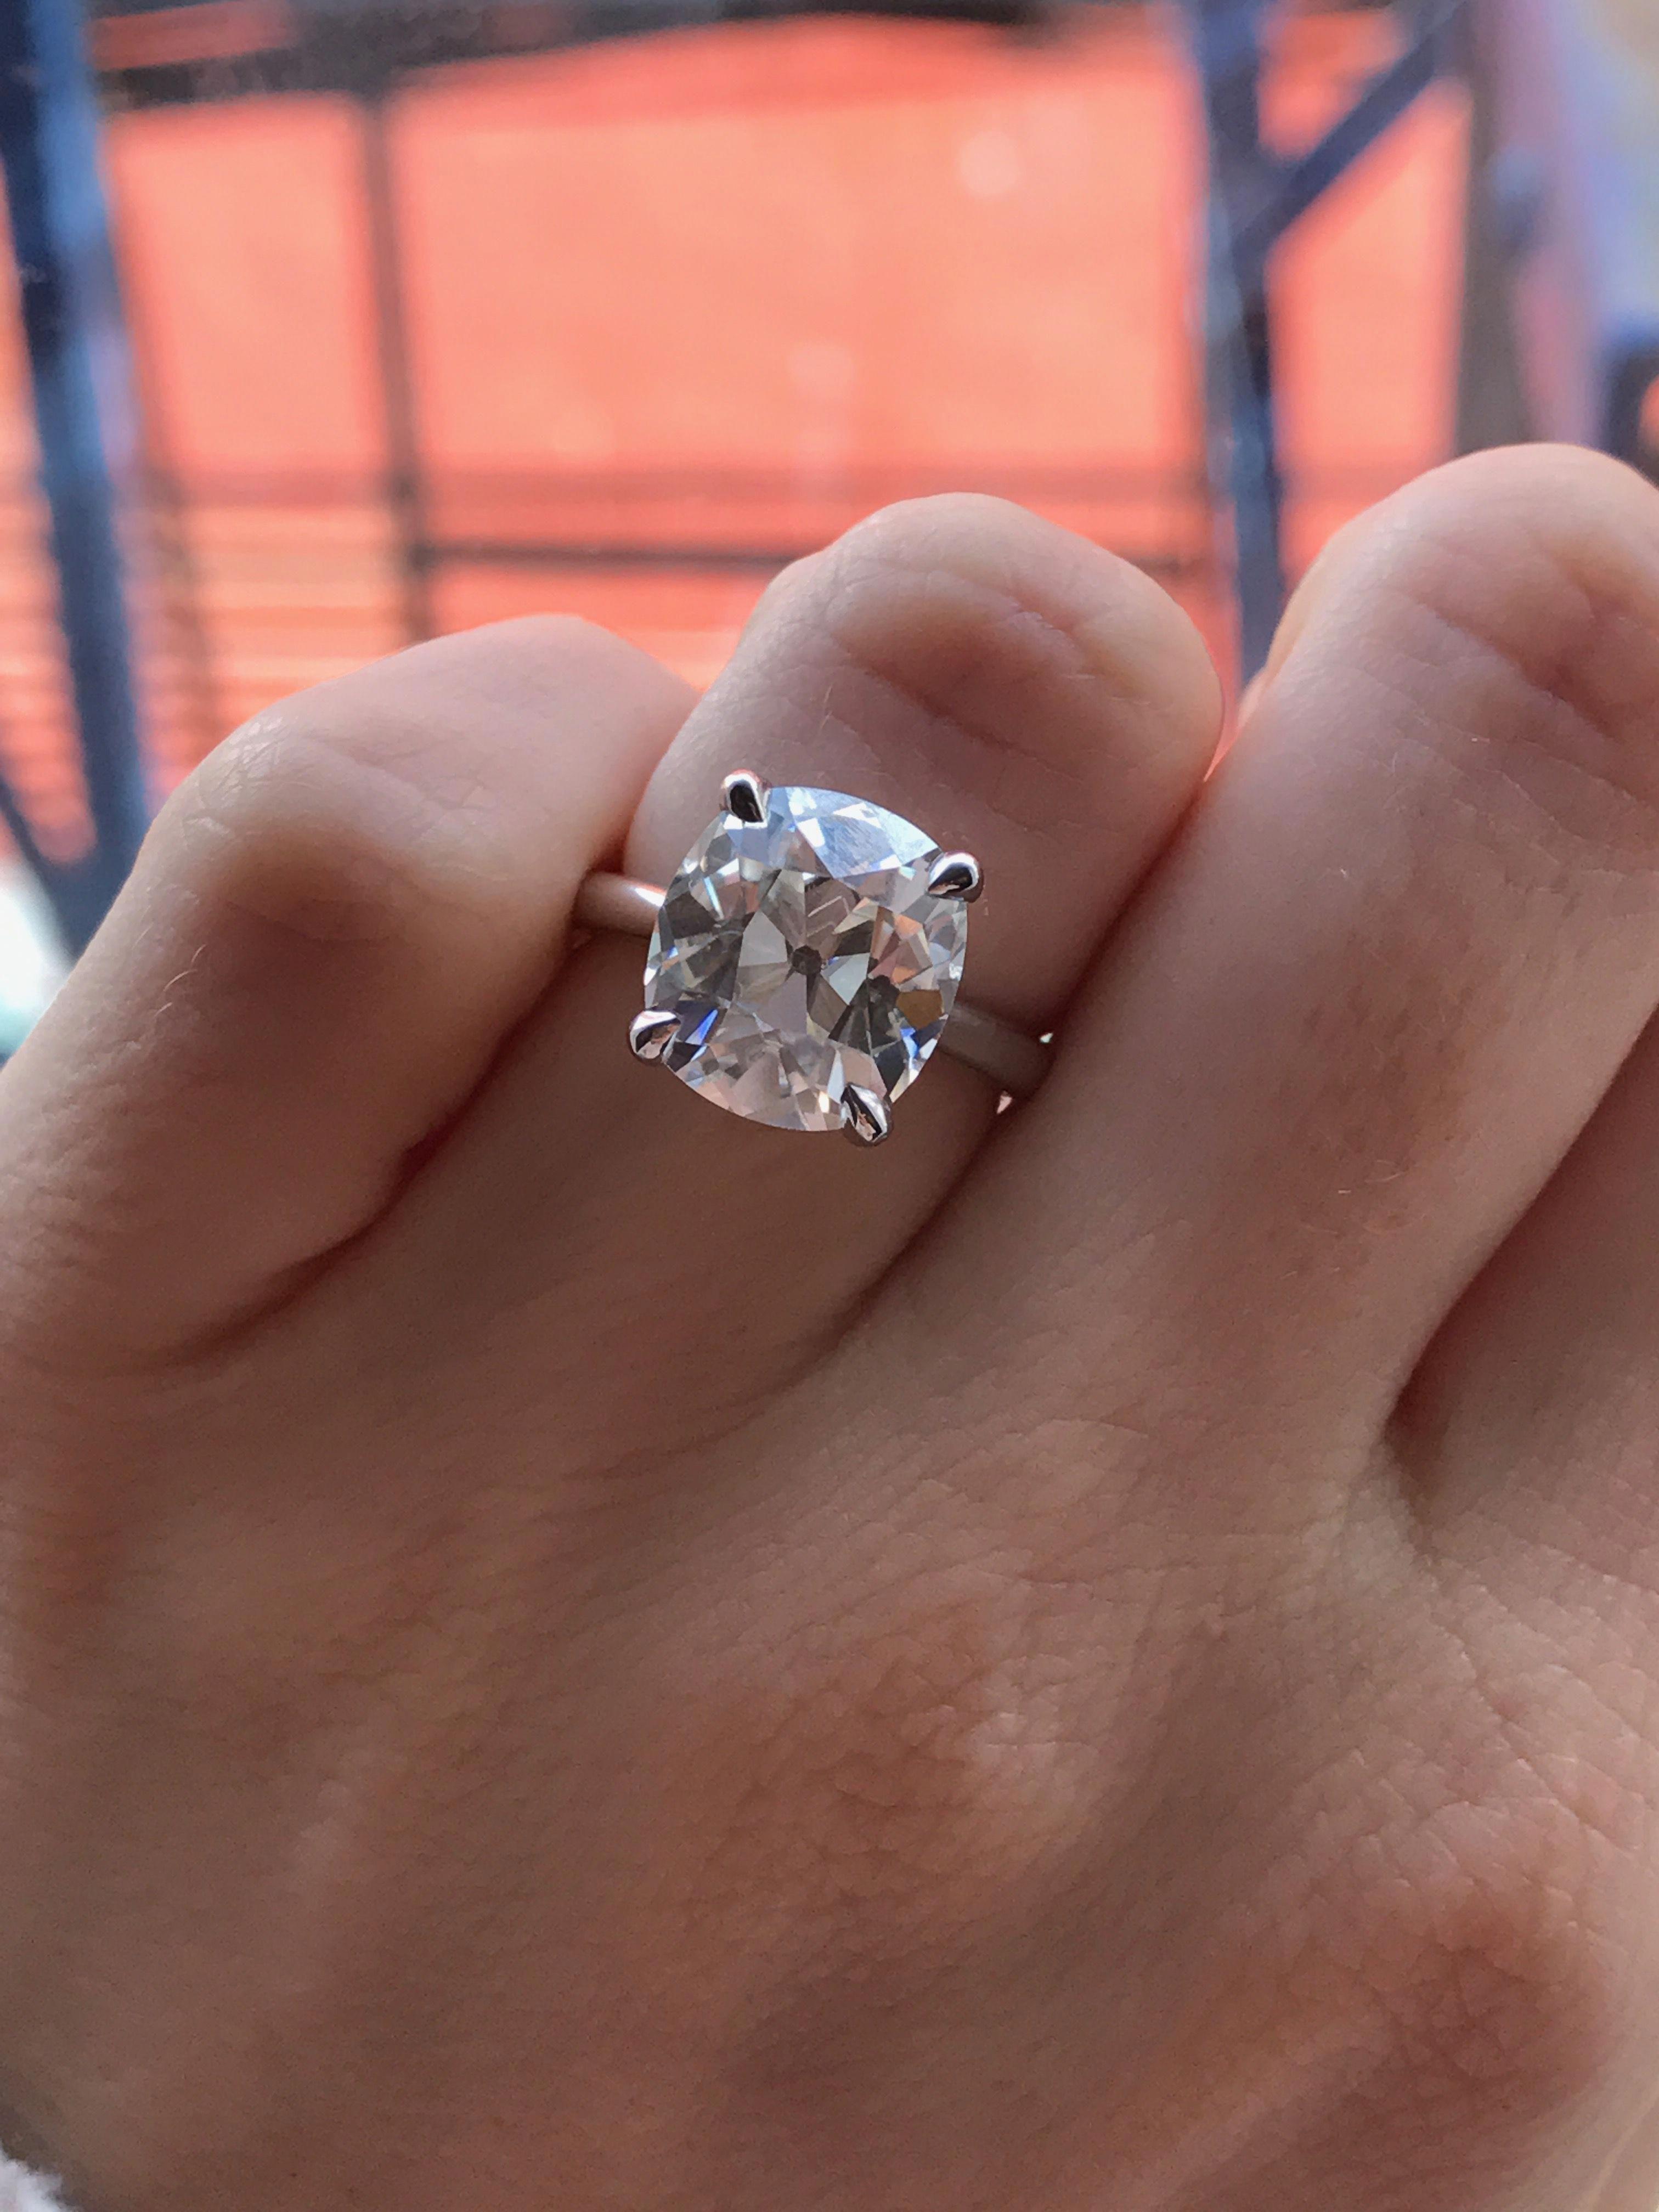 Pin On Diamond Rings I Adore X